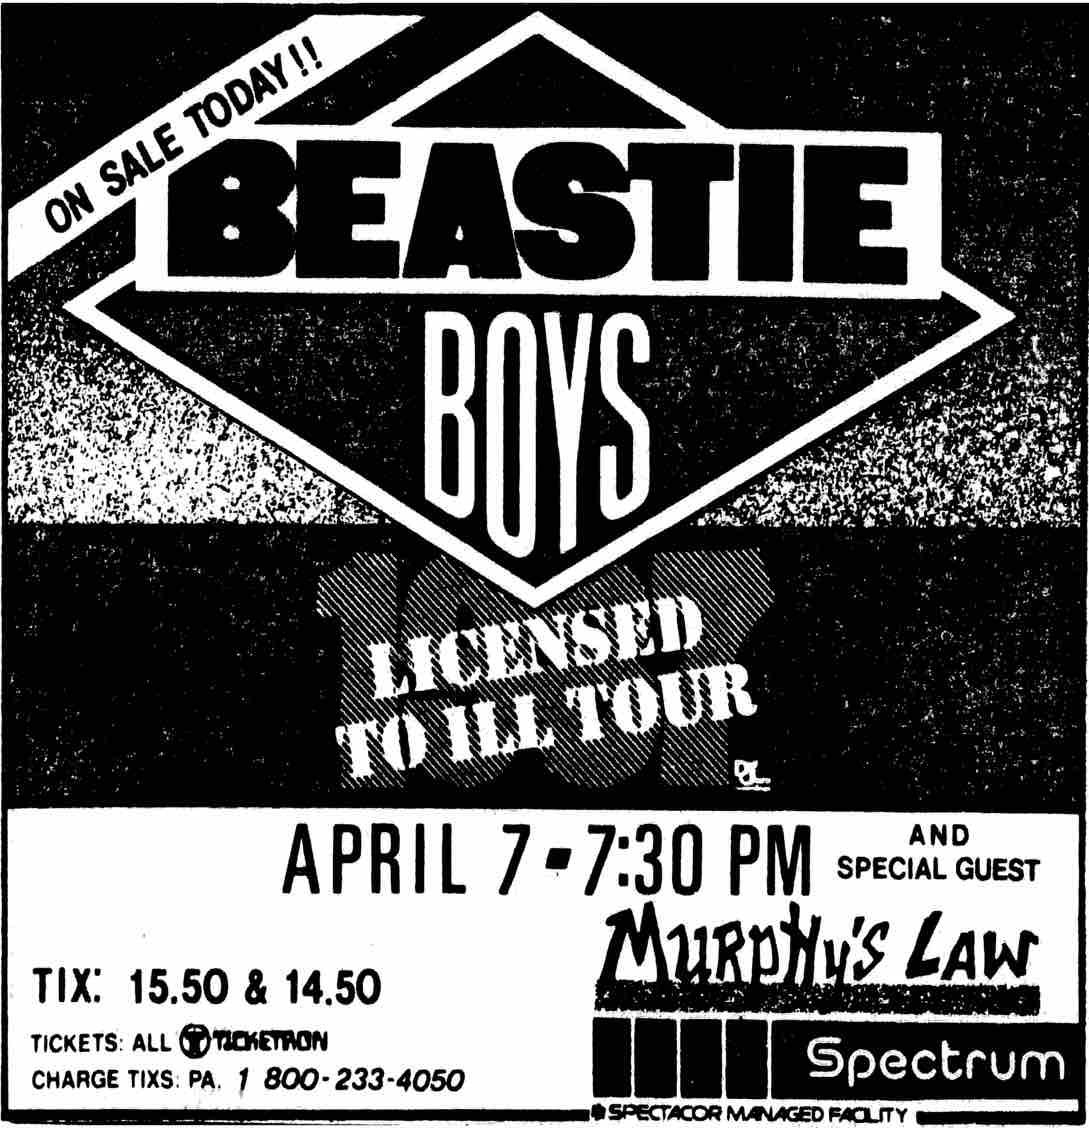 beastie boys newspaper ad